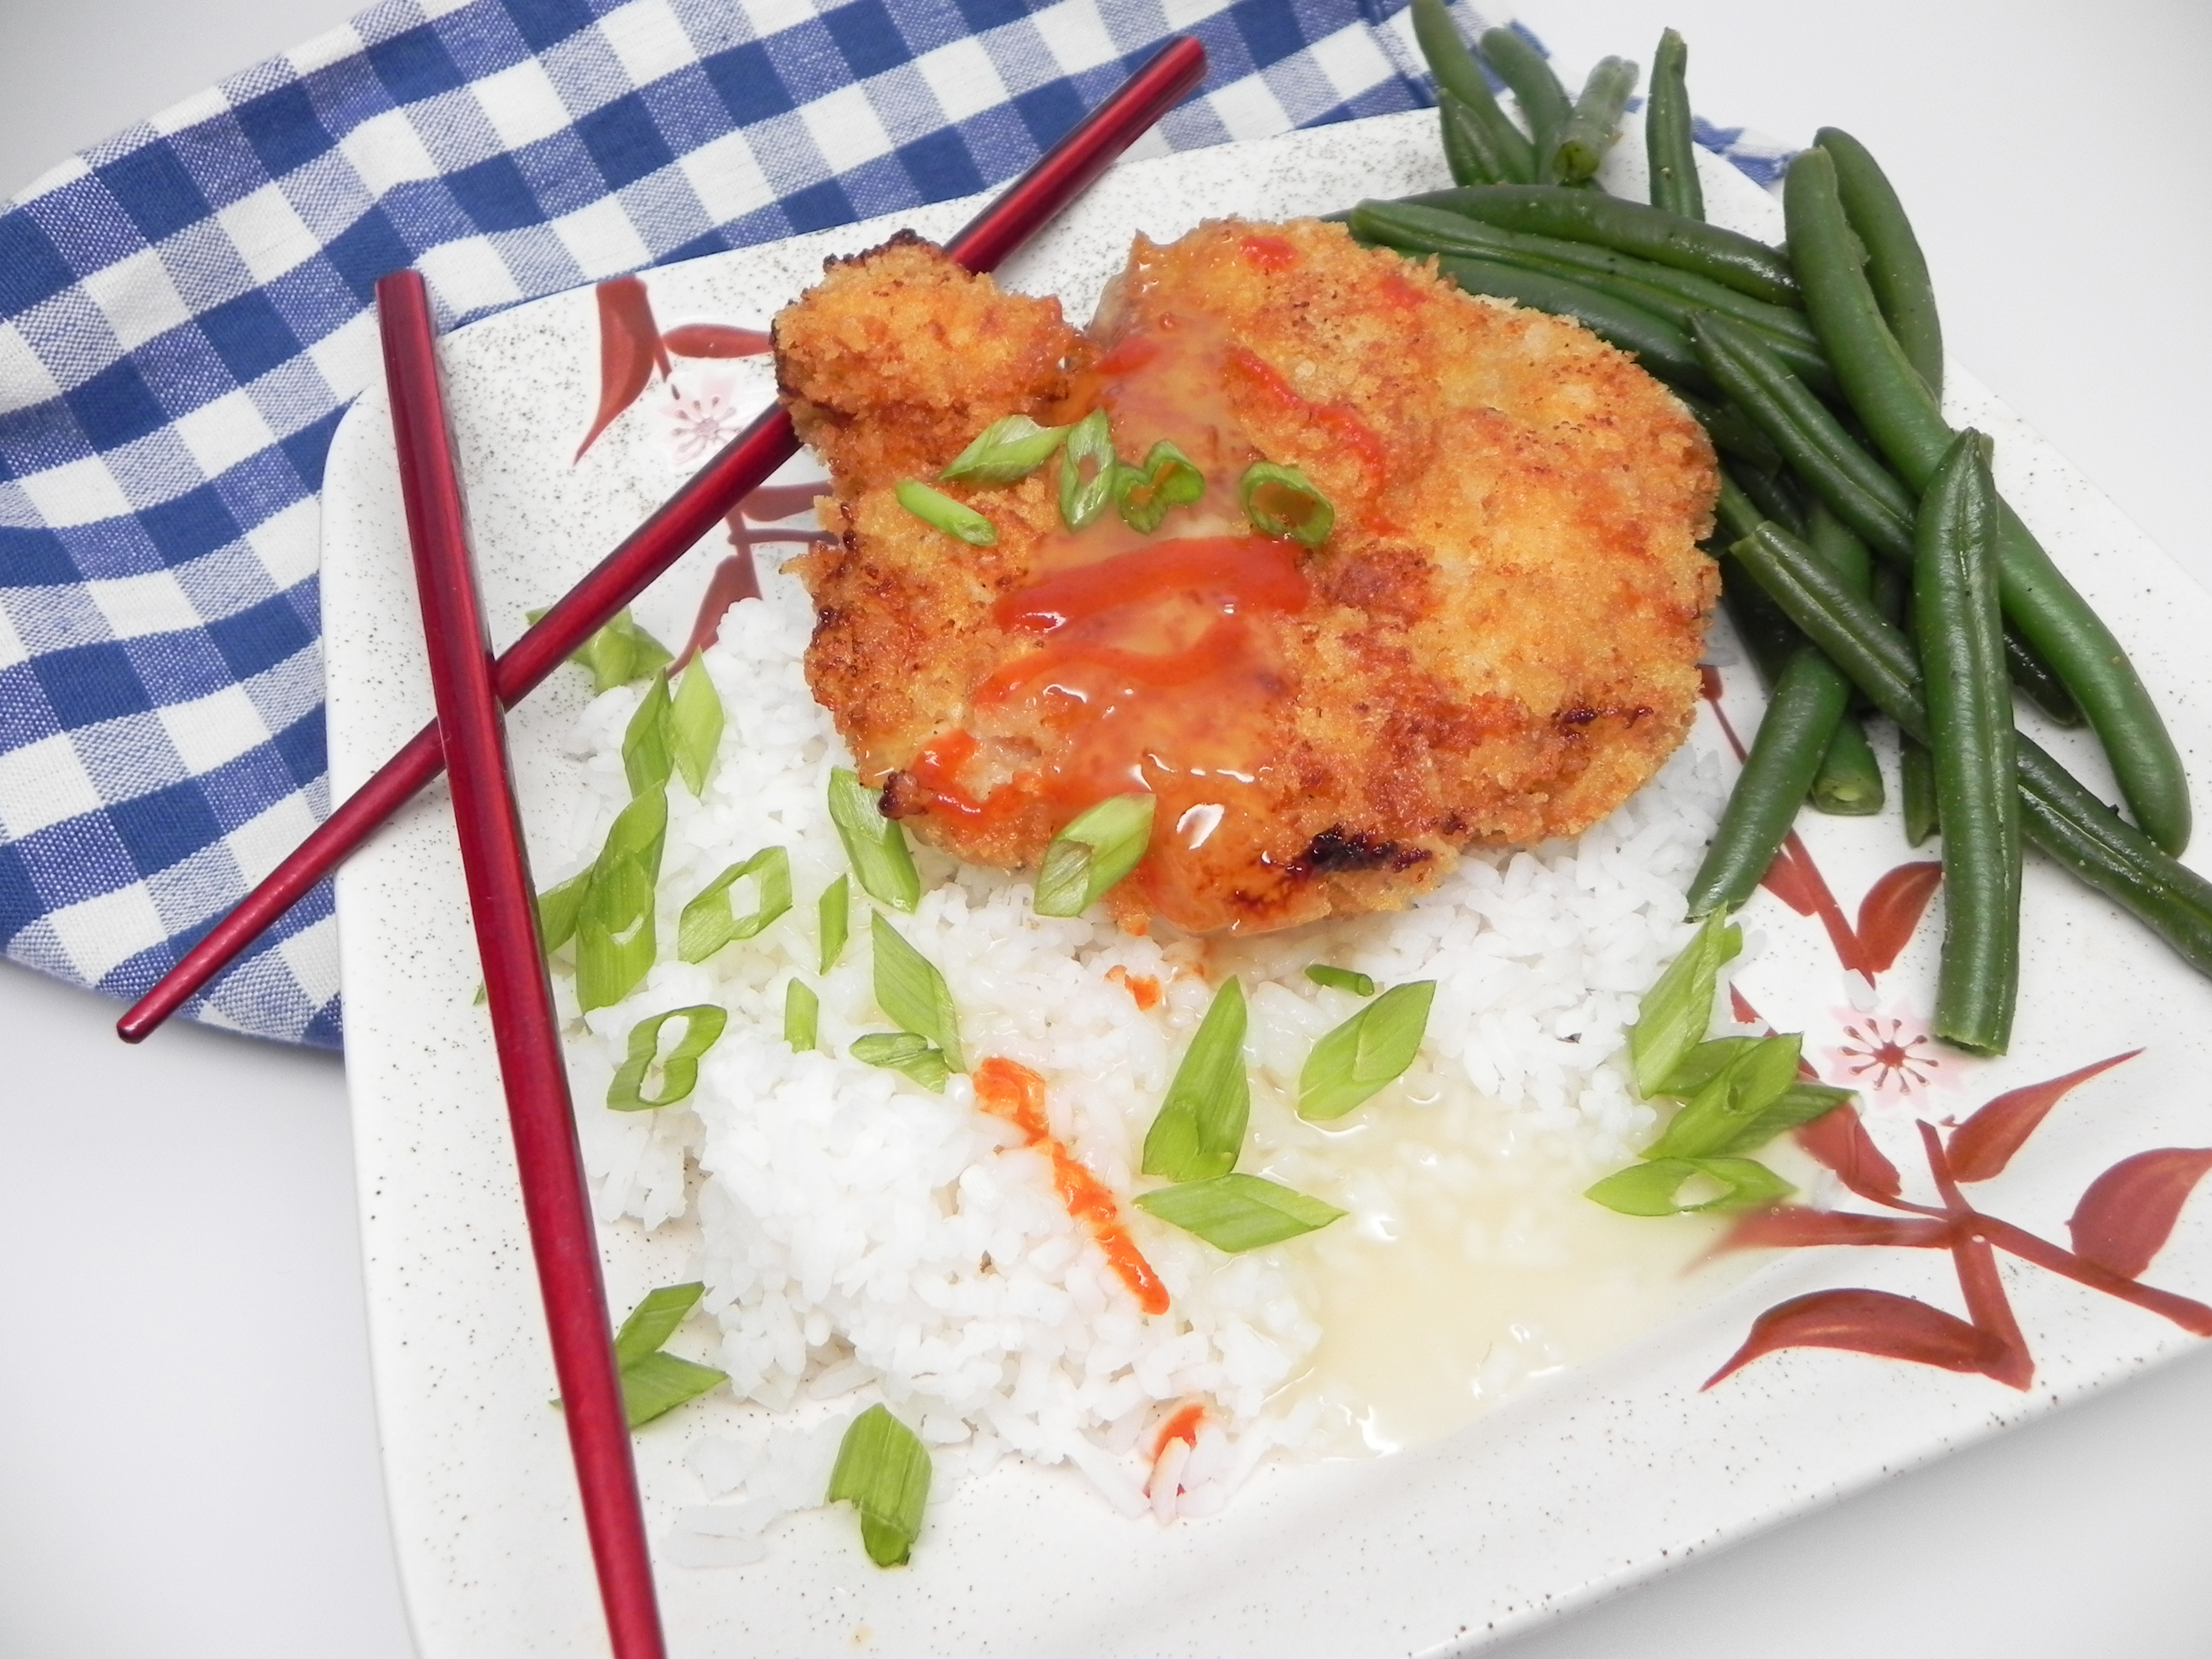 Chinese Takeout Lemon Chicken